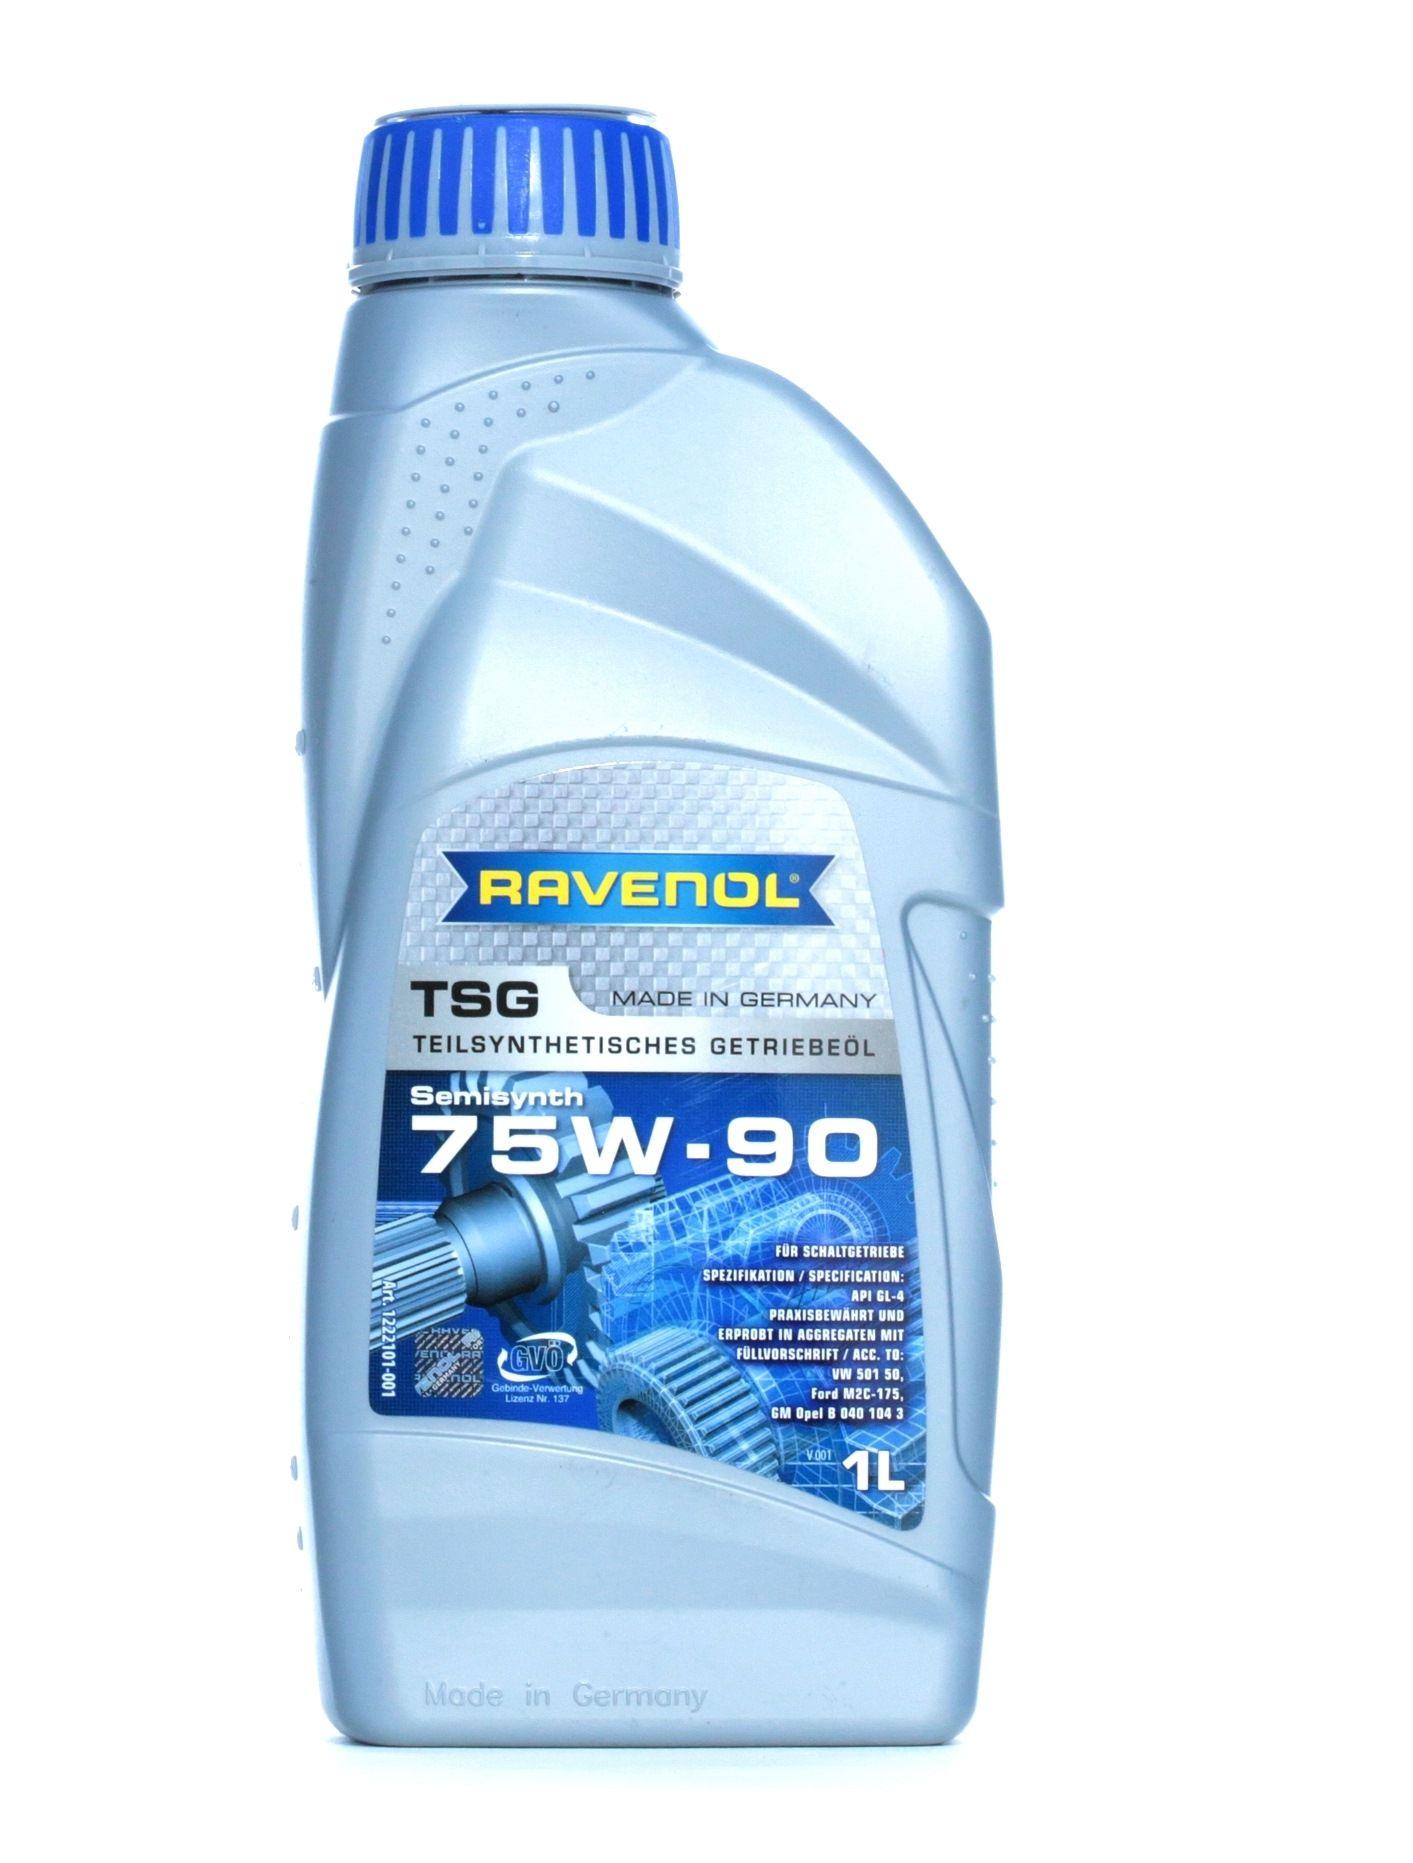 Getriebeöl RAVENOL 1222101-001-01-999 Bewertung